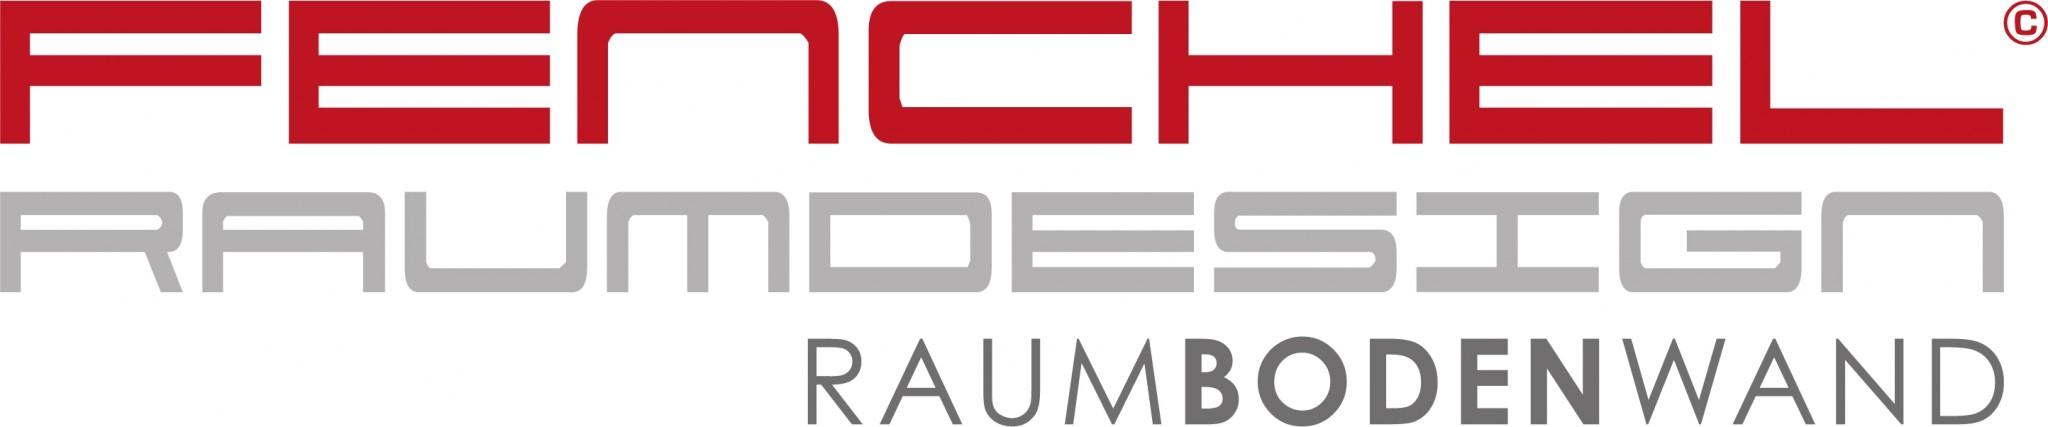 C. Fenchel GmbH & Co. KG